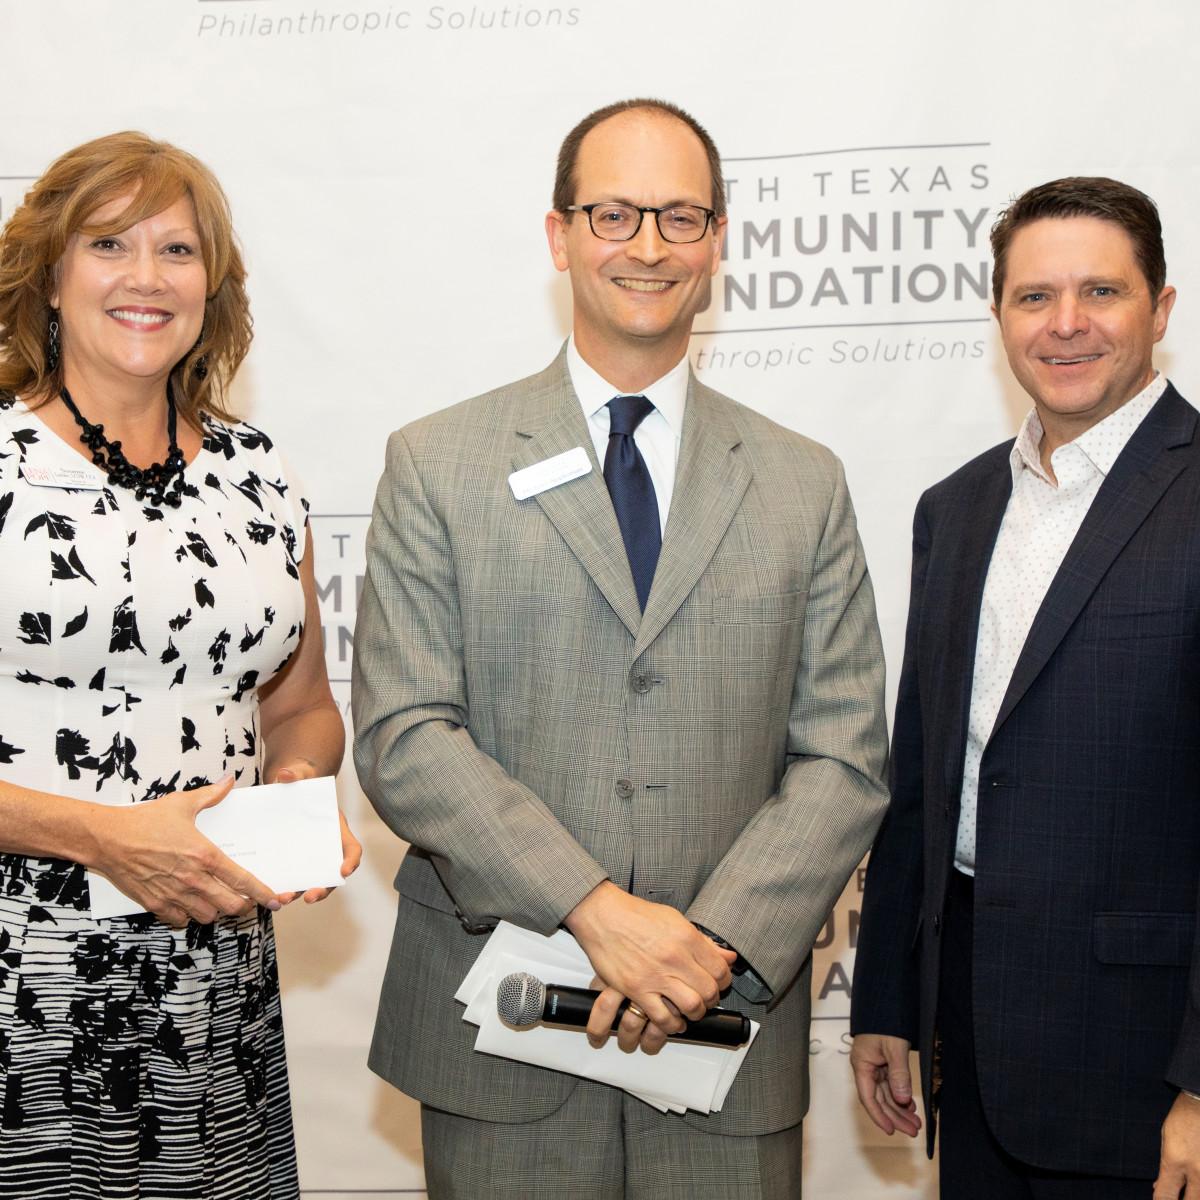 North Texas Community Foundation, Susanne Luebke, Michael Appleman, Todd Landry